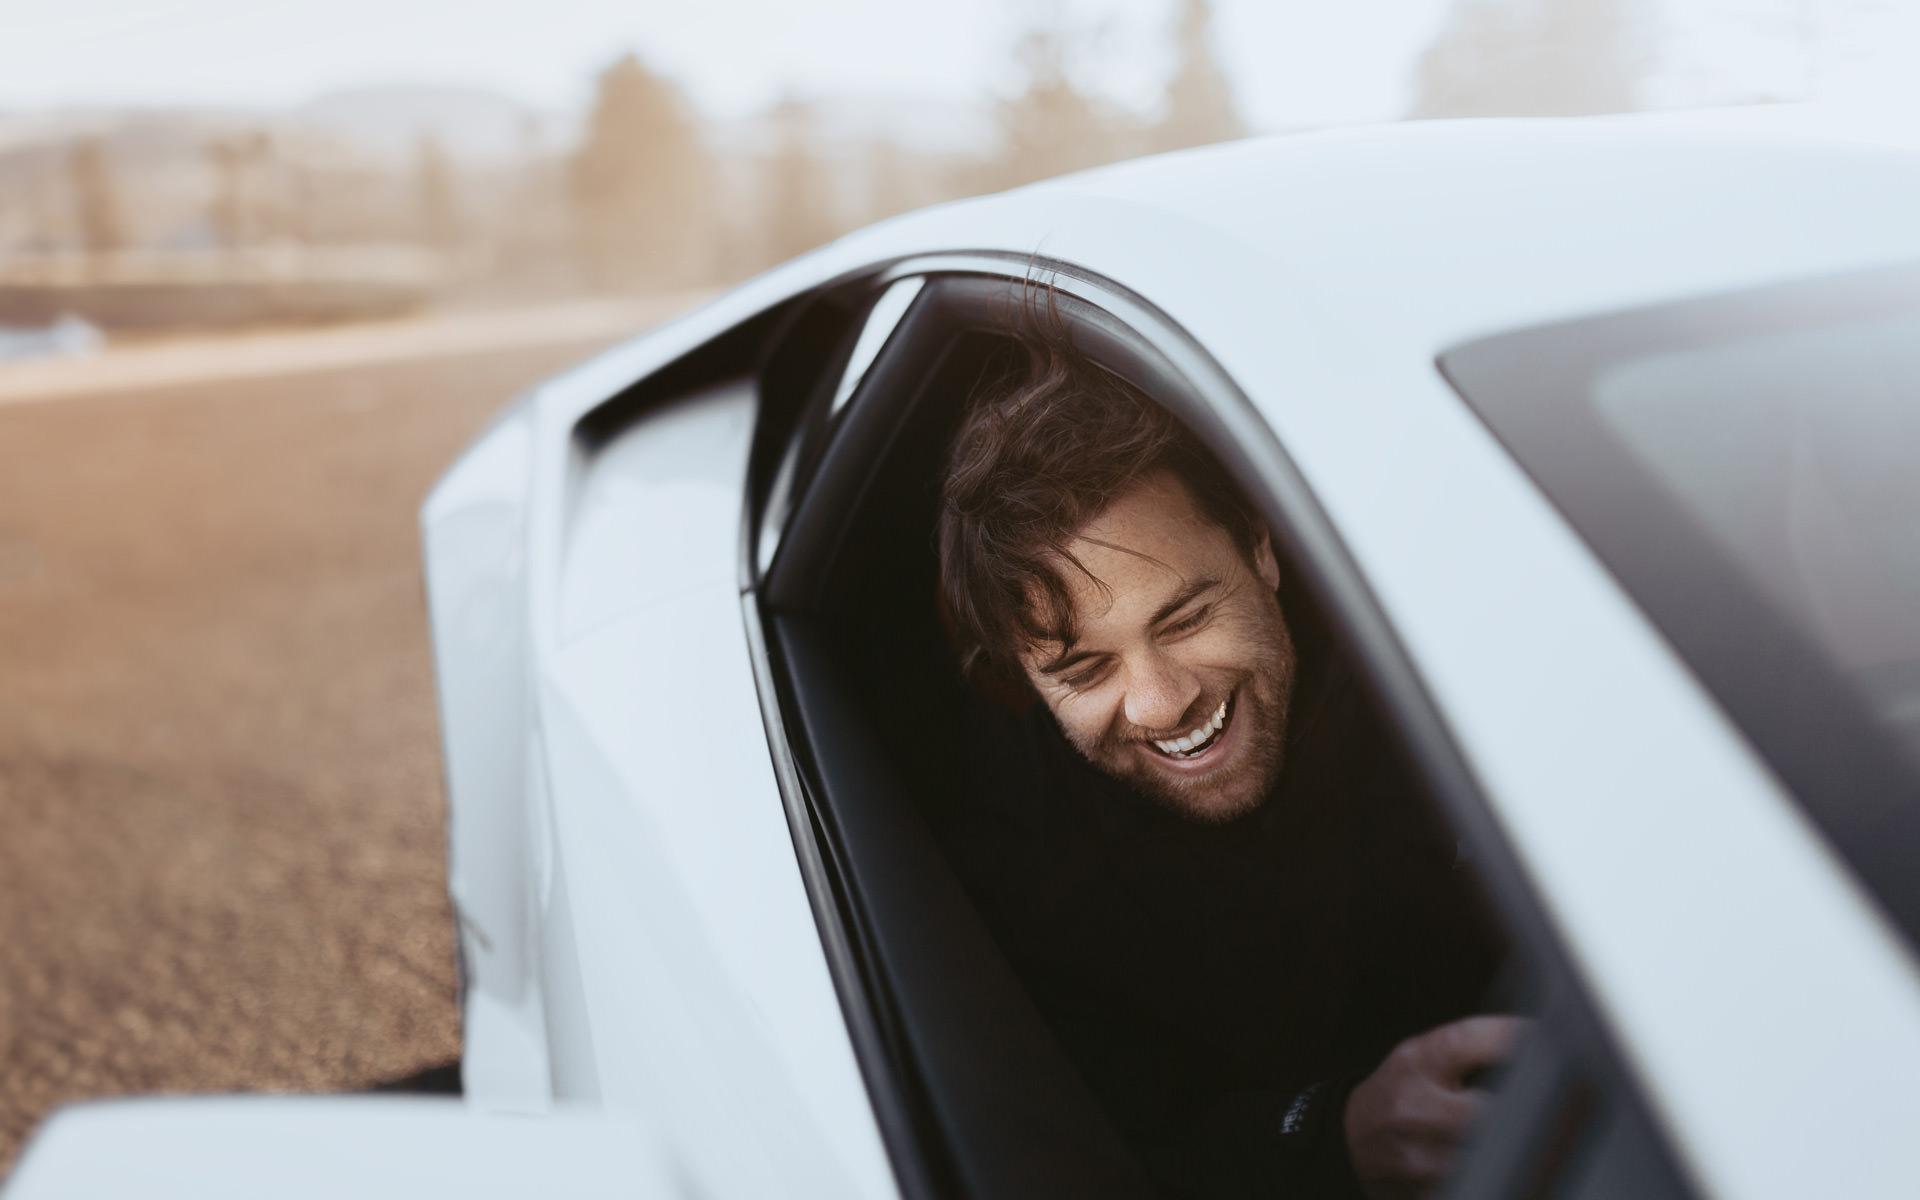 Prancing Horse Drive Experiences Australia - Drive a Ferrari Lamborghini Aston Martin Maserati and a stable of supercars